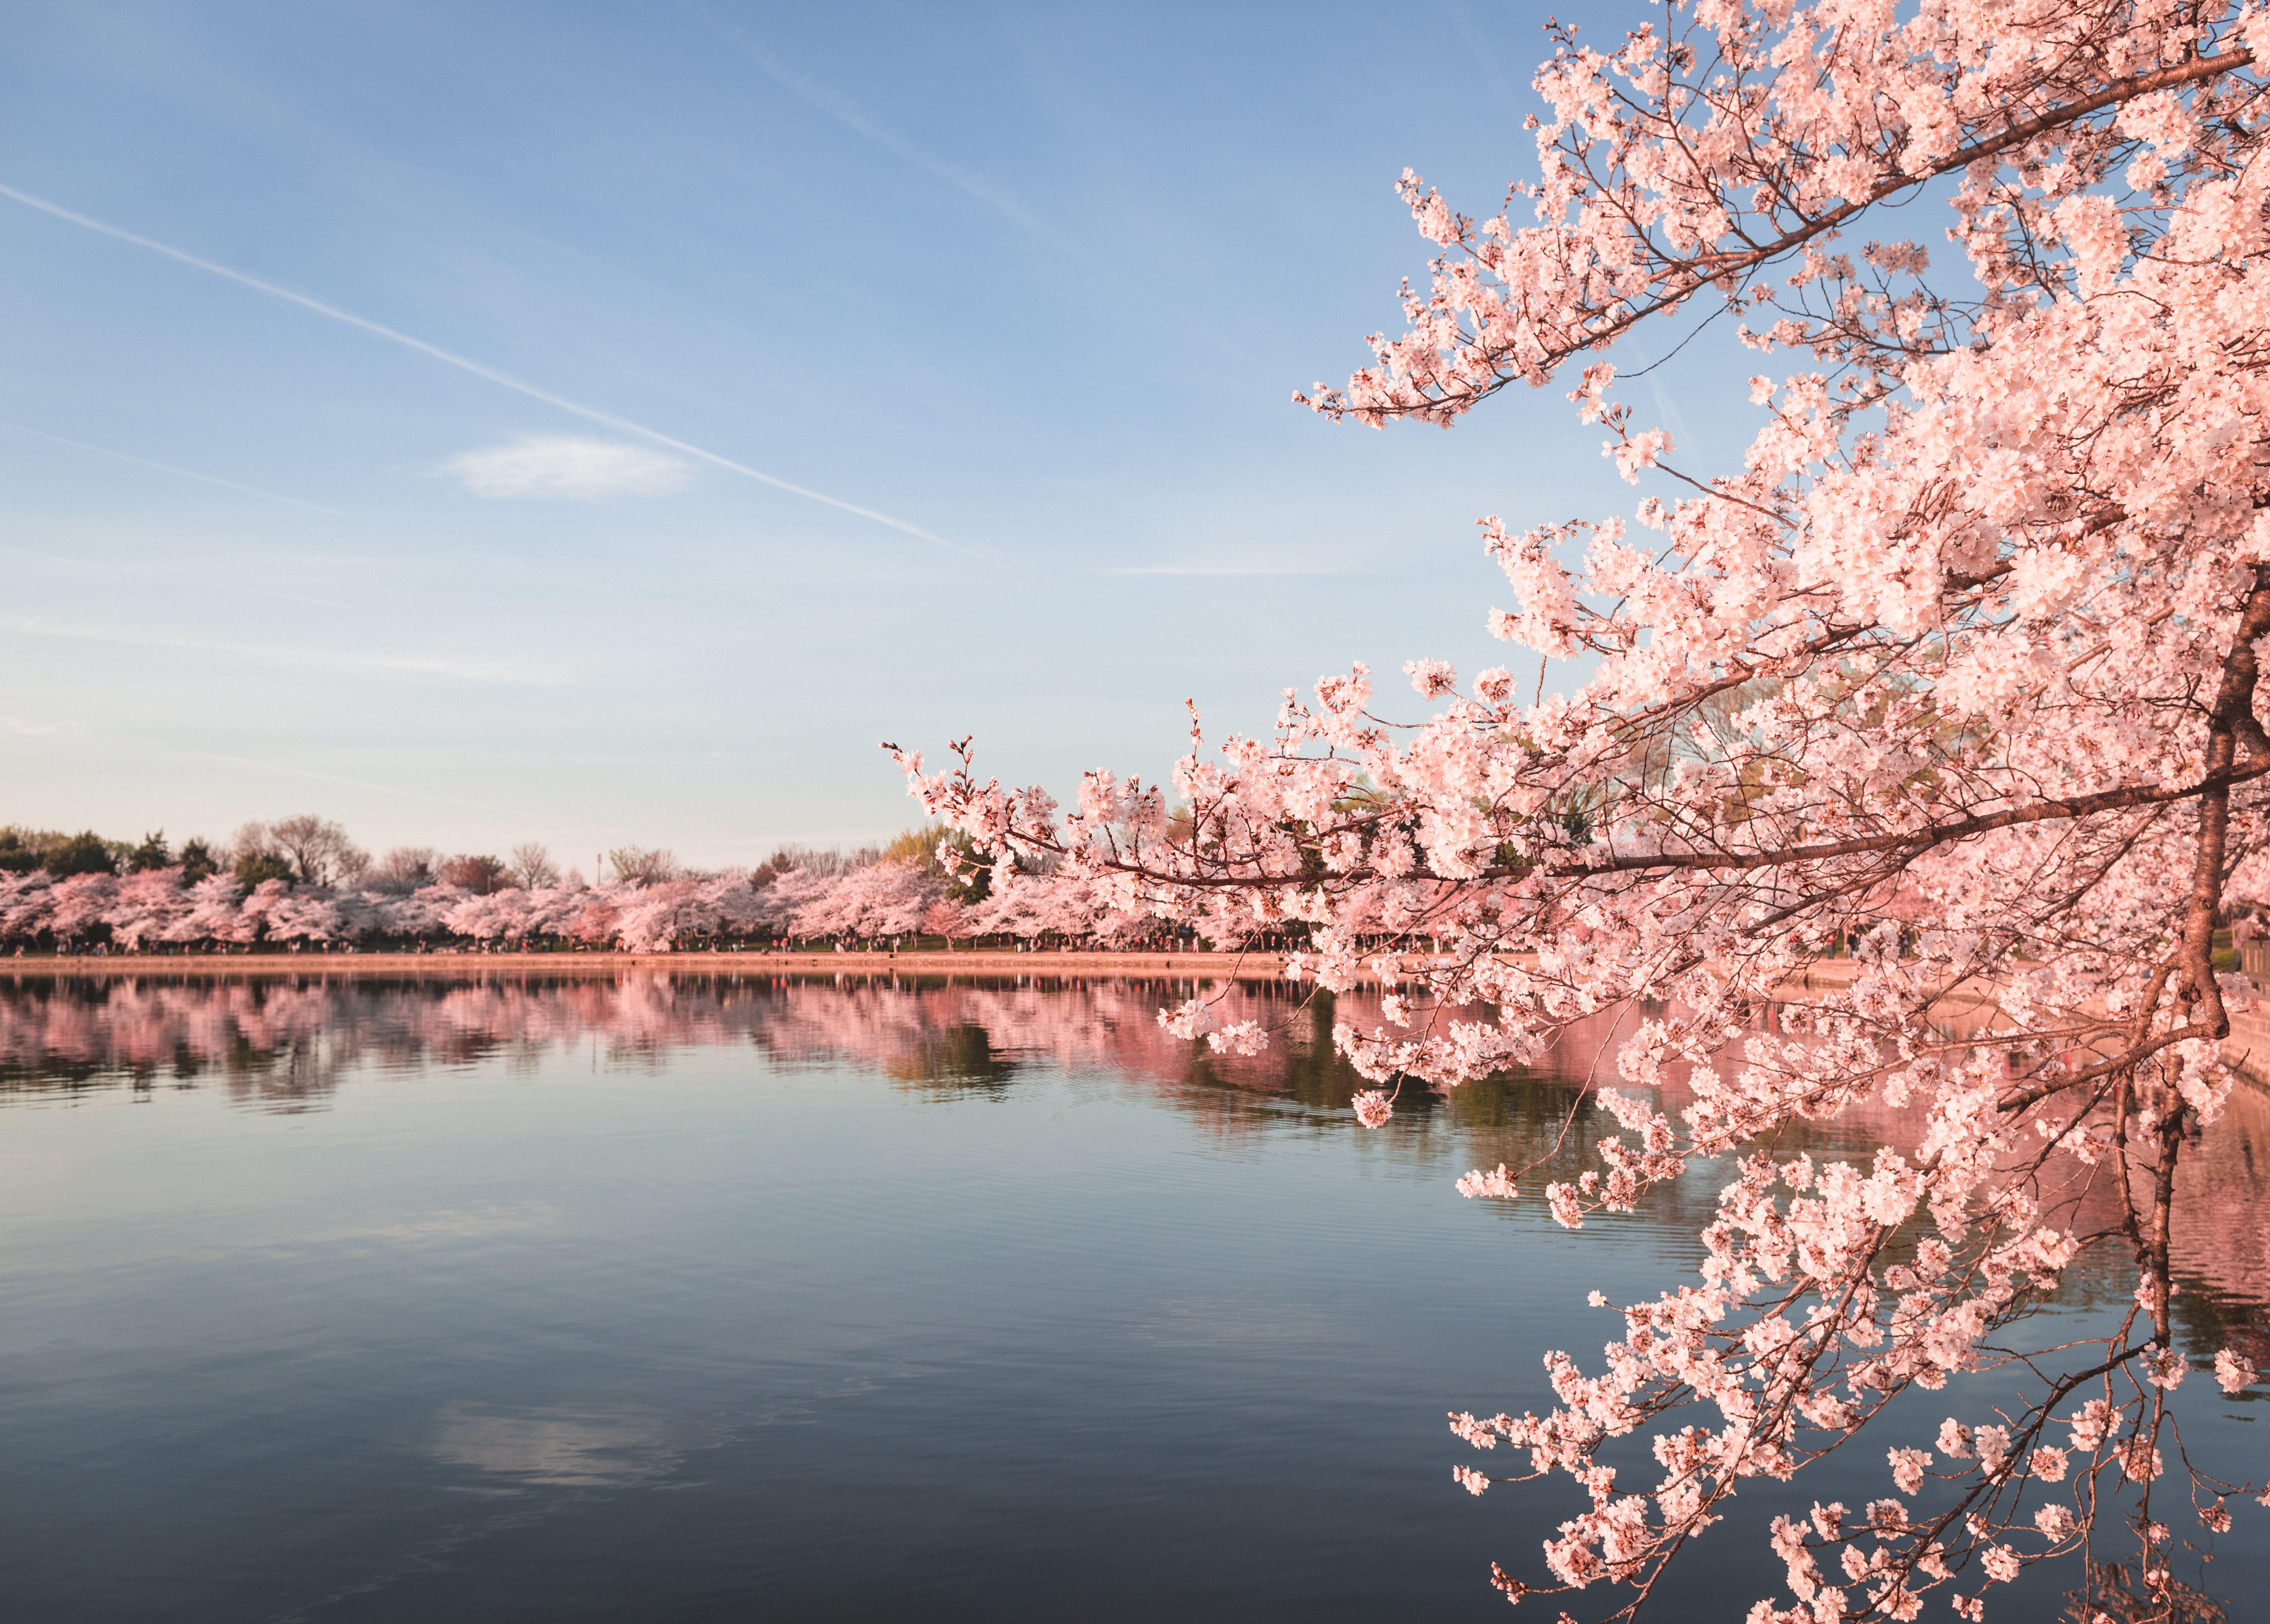 Amazing Photos Of Peak Cherry Blossom Bloom In Dc Cherry Blossom Dc Cherry Blossom Festival Cherry Blossom